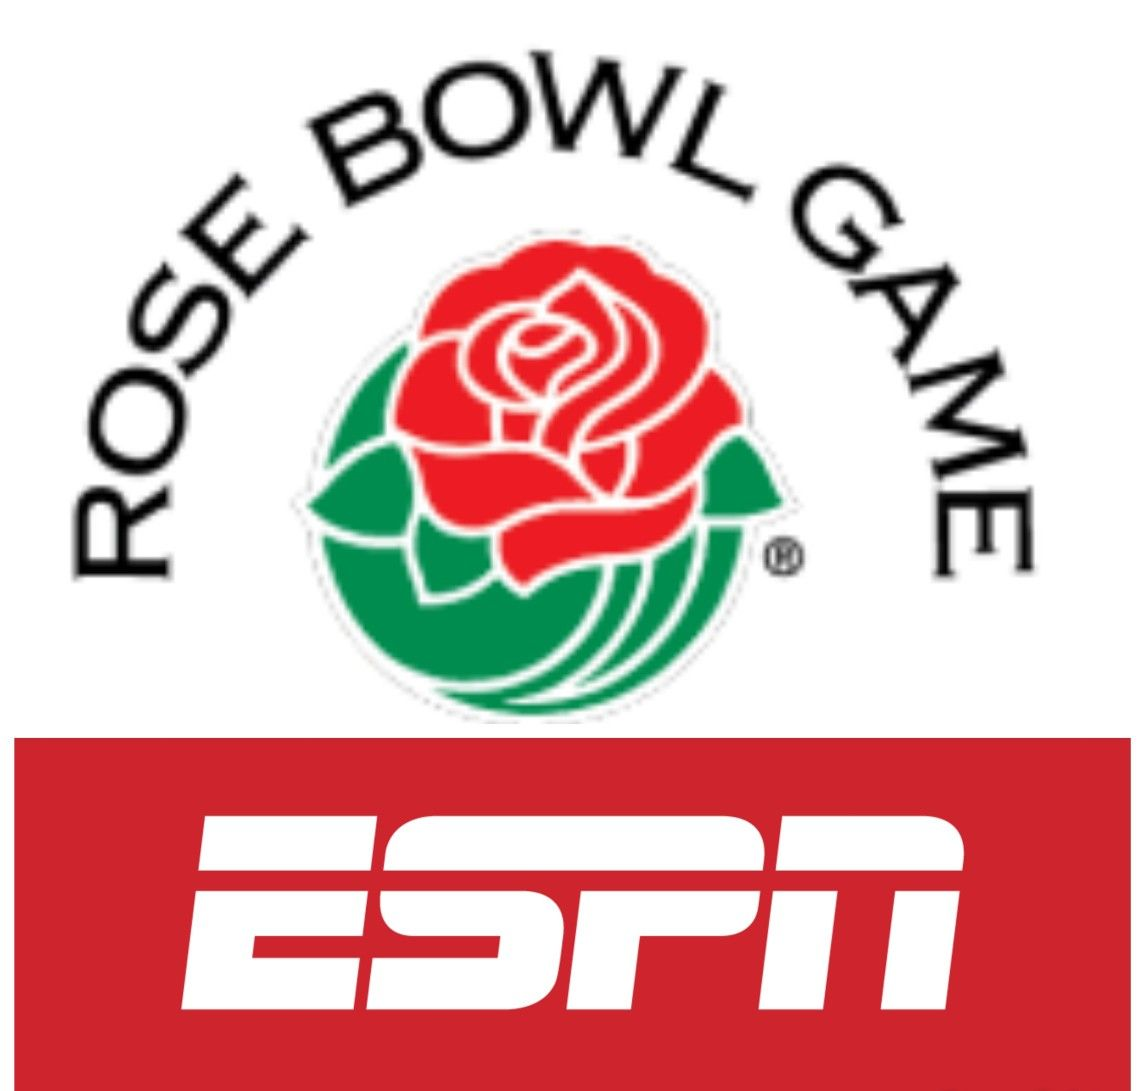 Pin by chef eddie g on chef eddie g rose bowl game bowl